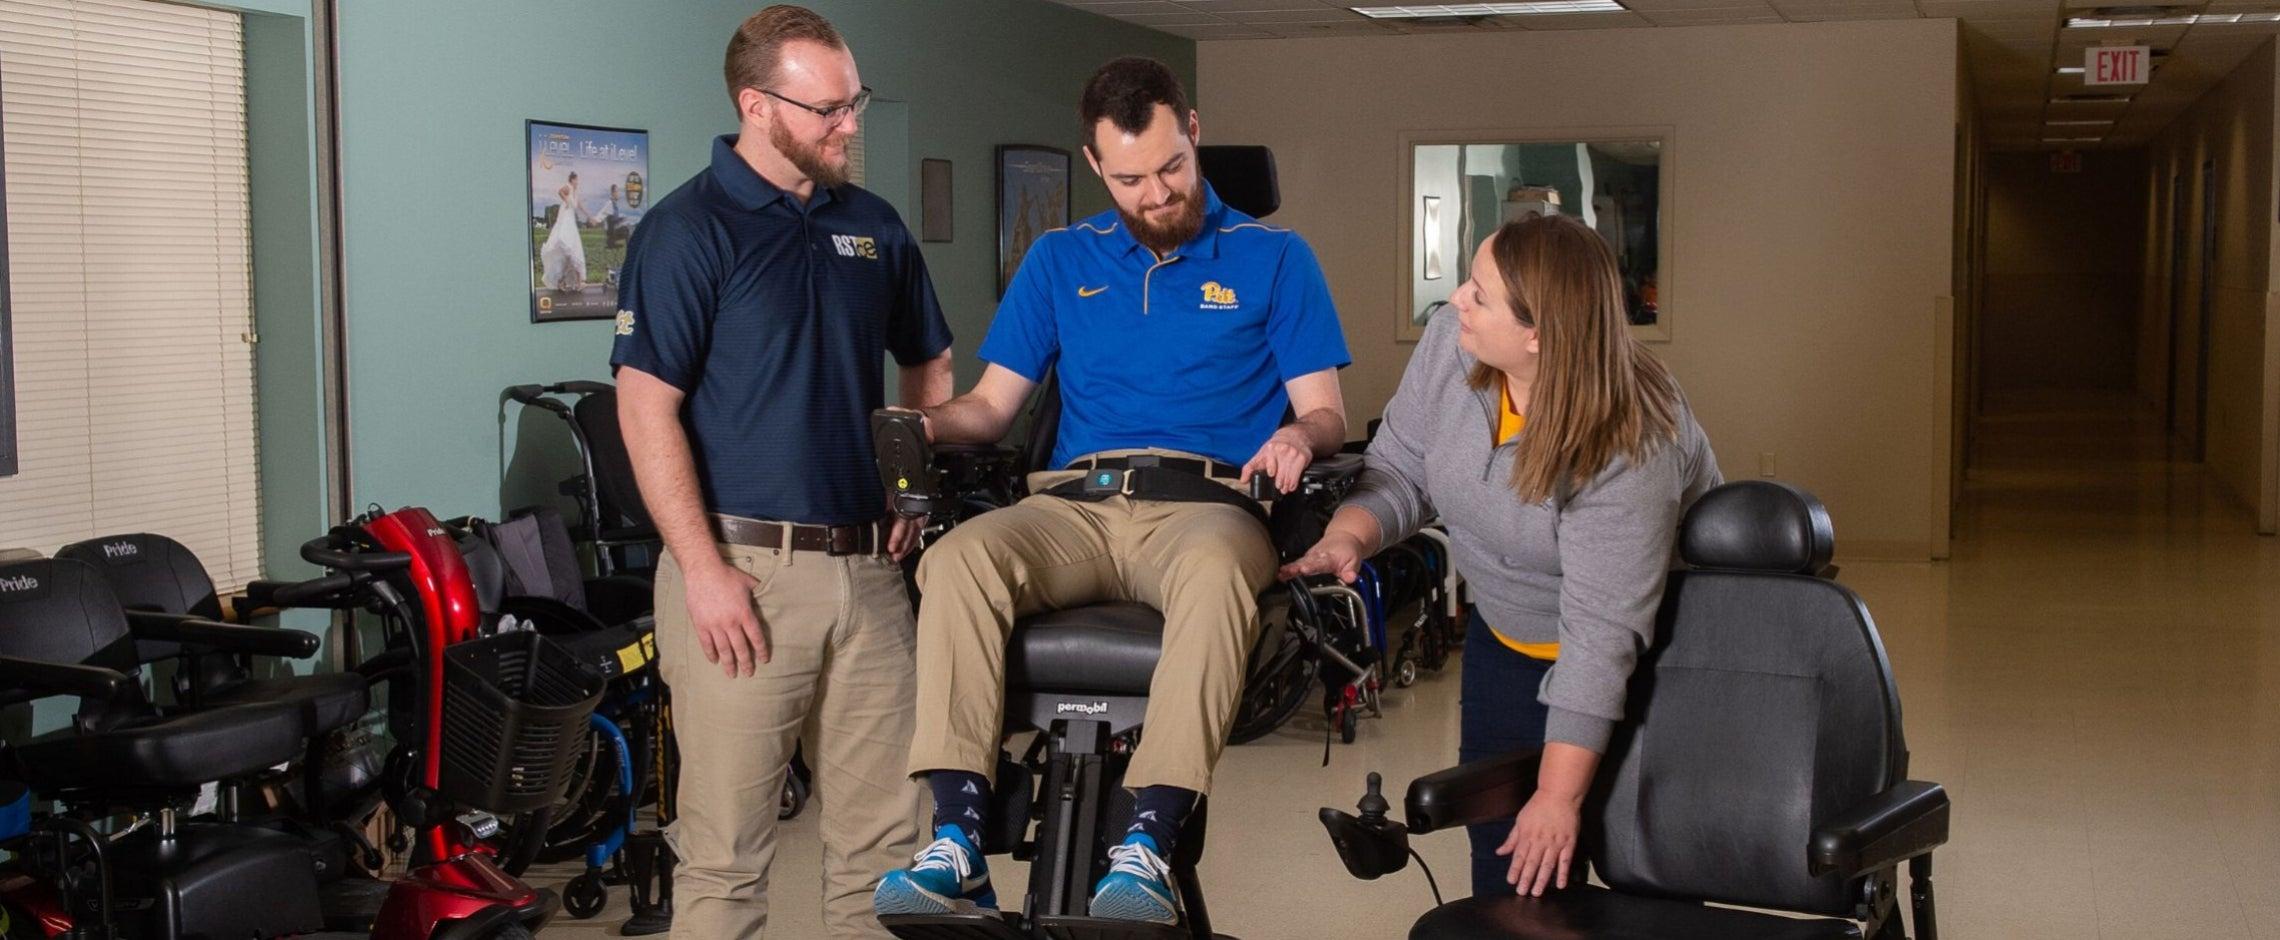 Rehab engineers explaining power wheelchair